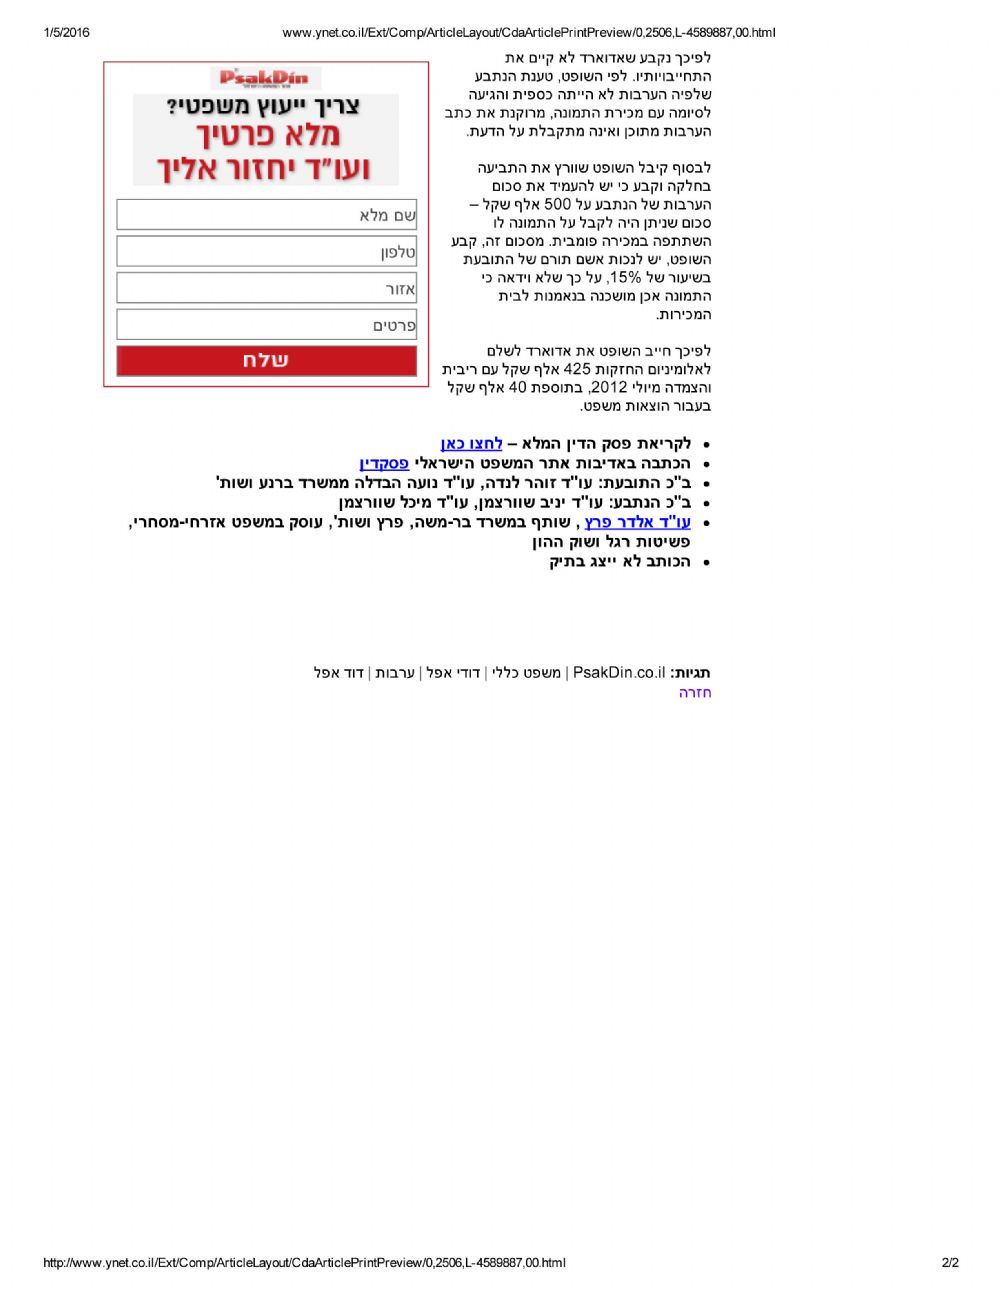 Ynet עורך דין שוק ההון מסחר בפורקס תביעות פיננסיות